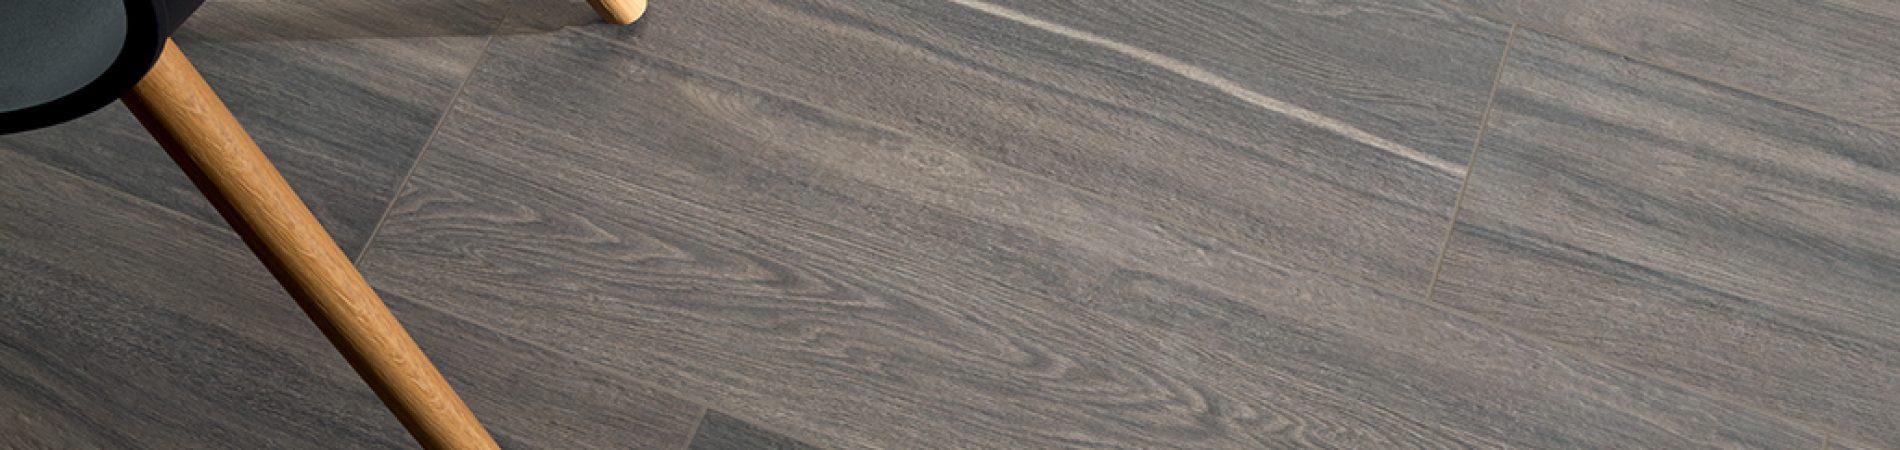 Pavimenti-in-gres_Ceramiche-Coem_Signum1